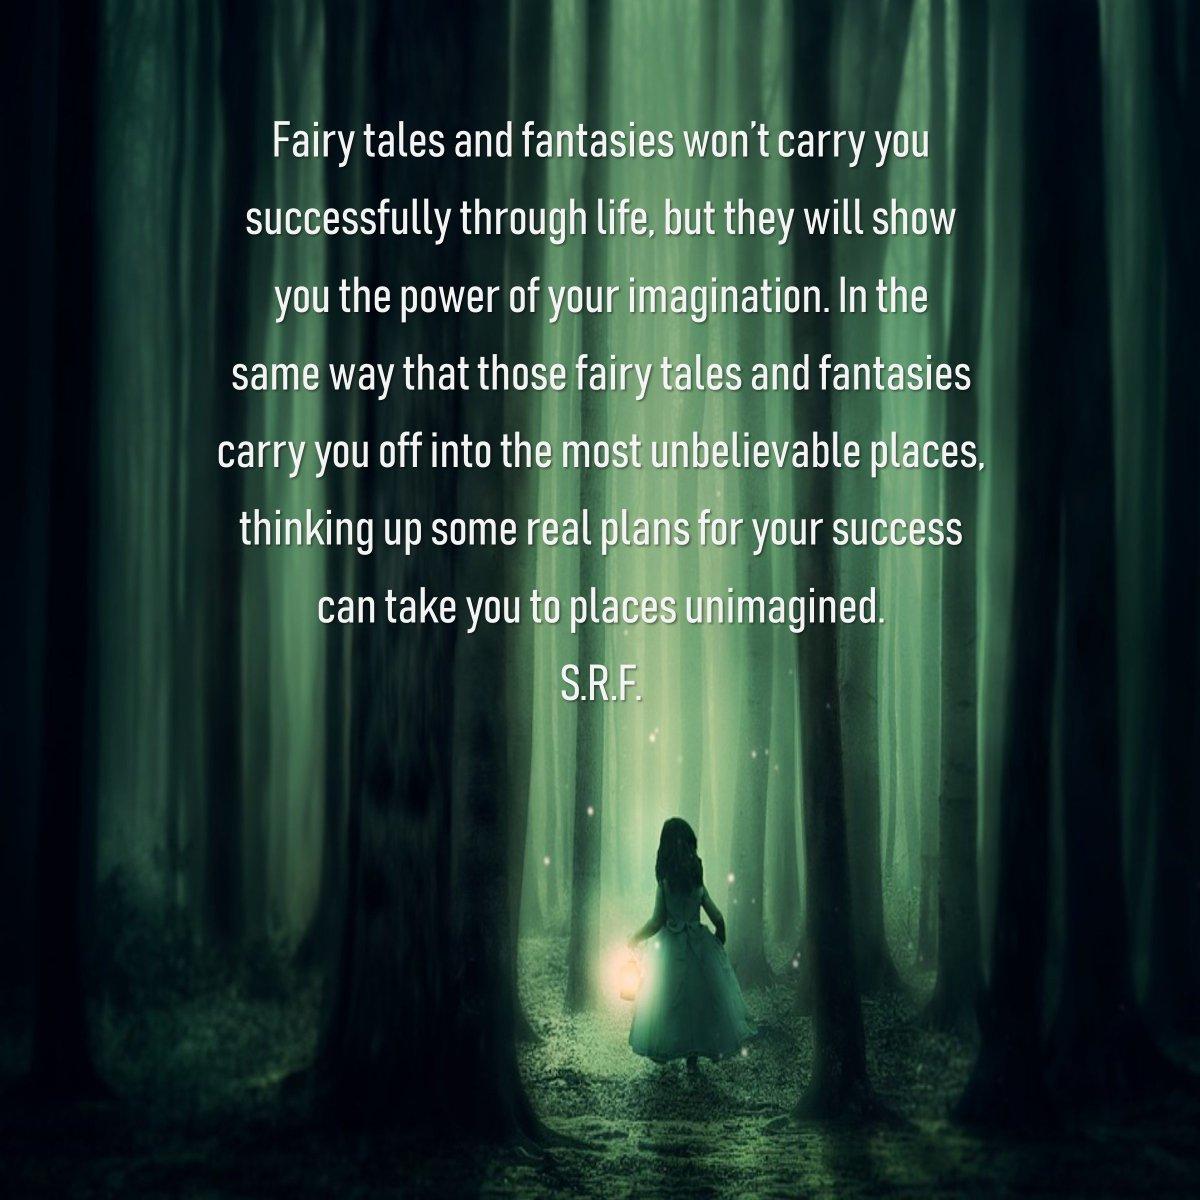 Can you imagine? ~ S.R.F. #letstalkaboutfaith https://faithishowwelive.blogspot.com/2019/01/unimagined-places.html…